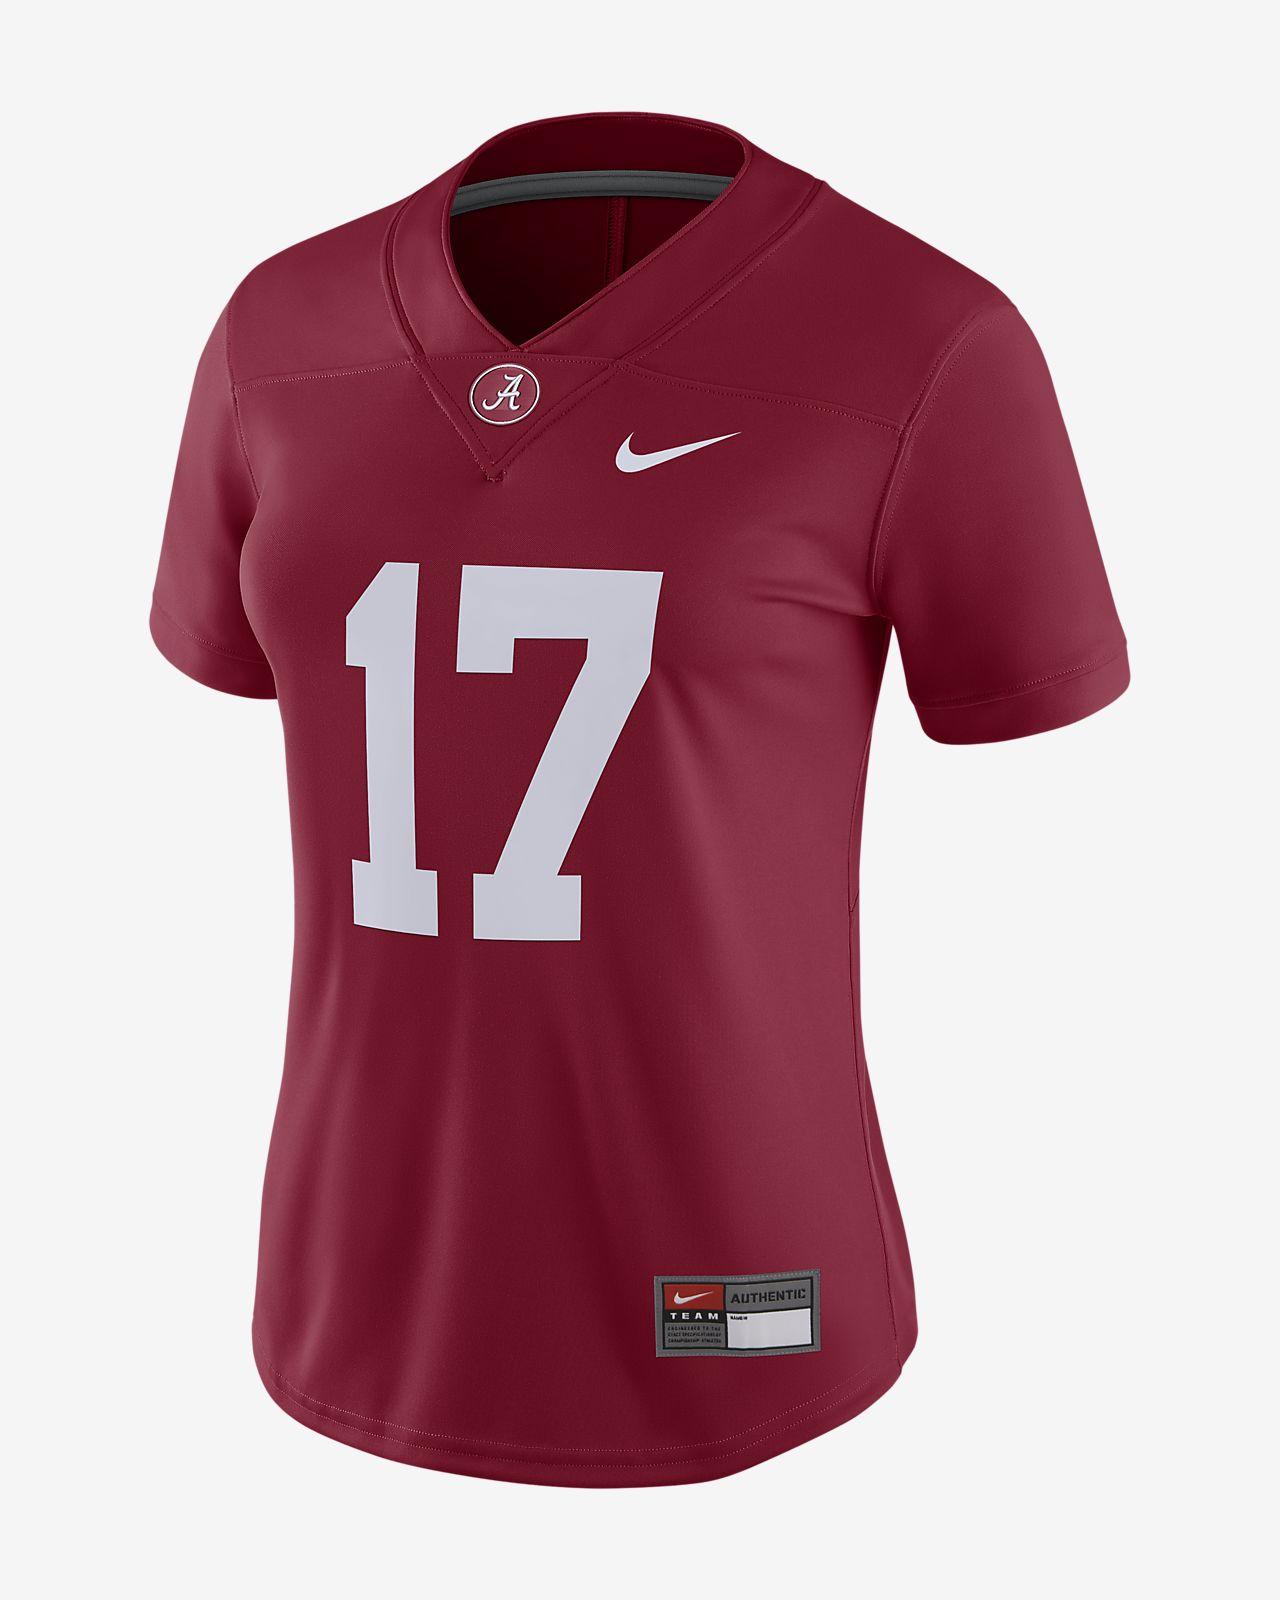 new product 64e8d 0e937 Nike College Dri-FIT Game (Alabama) Women's Football Jersey